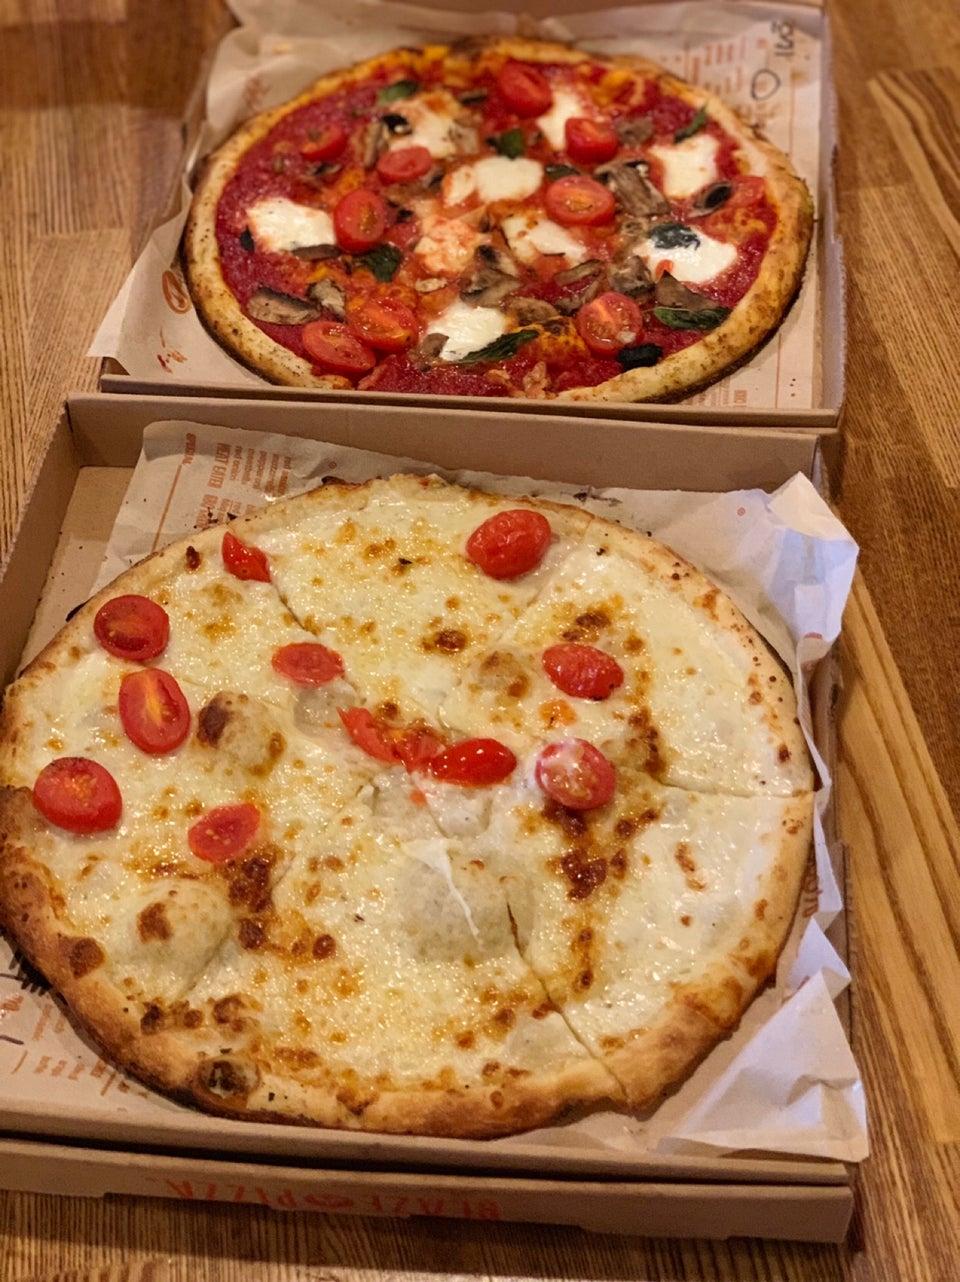 Blaze Pizza 1475 Western Ave, Albany